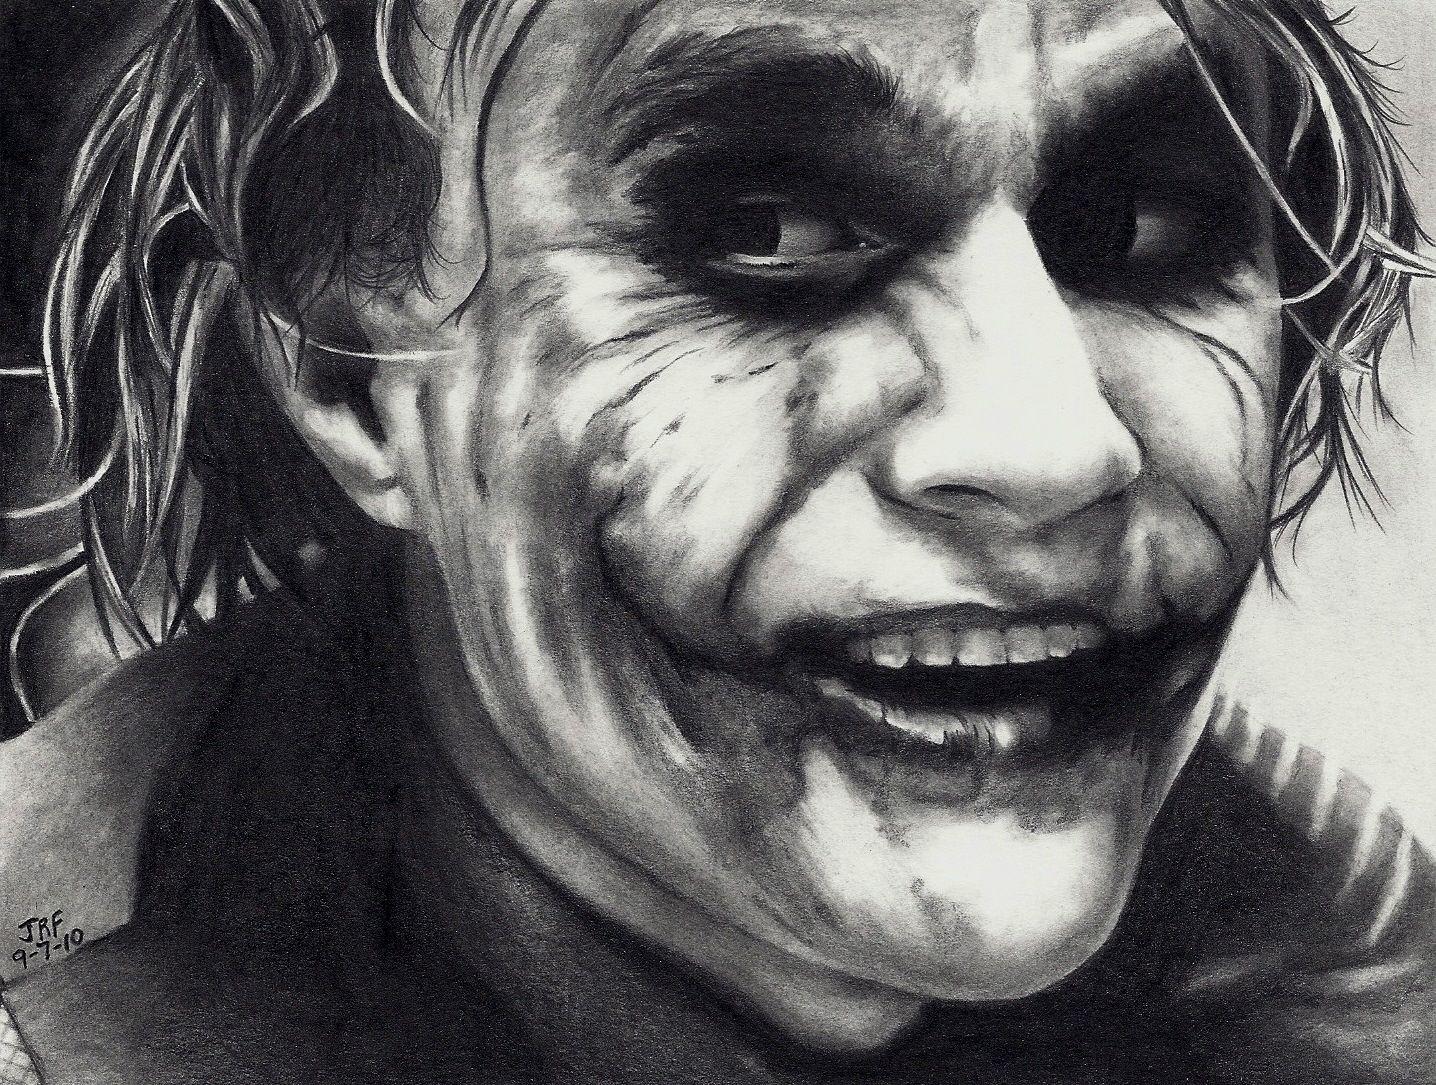 Joker Scribble Drawing : Joker pencil drawing art